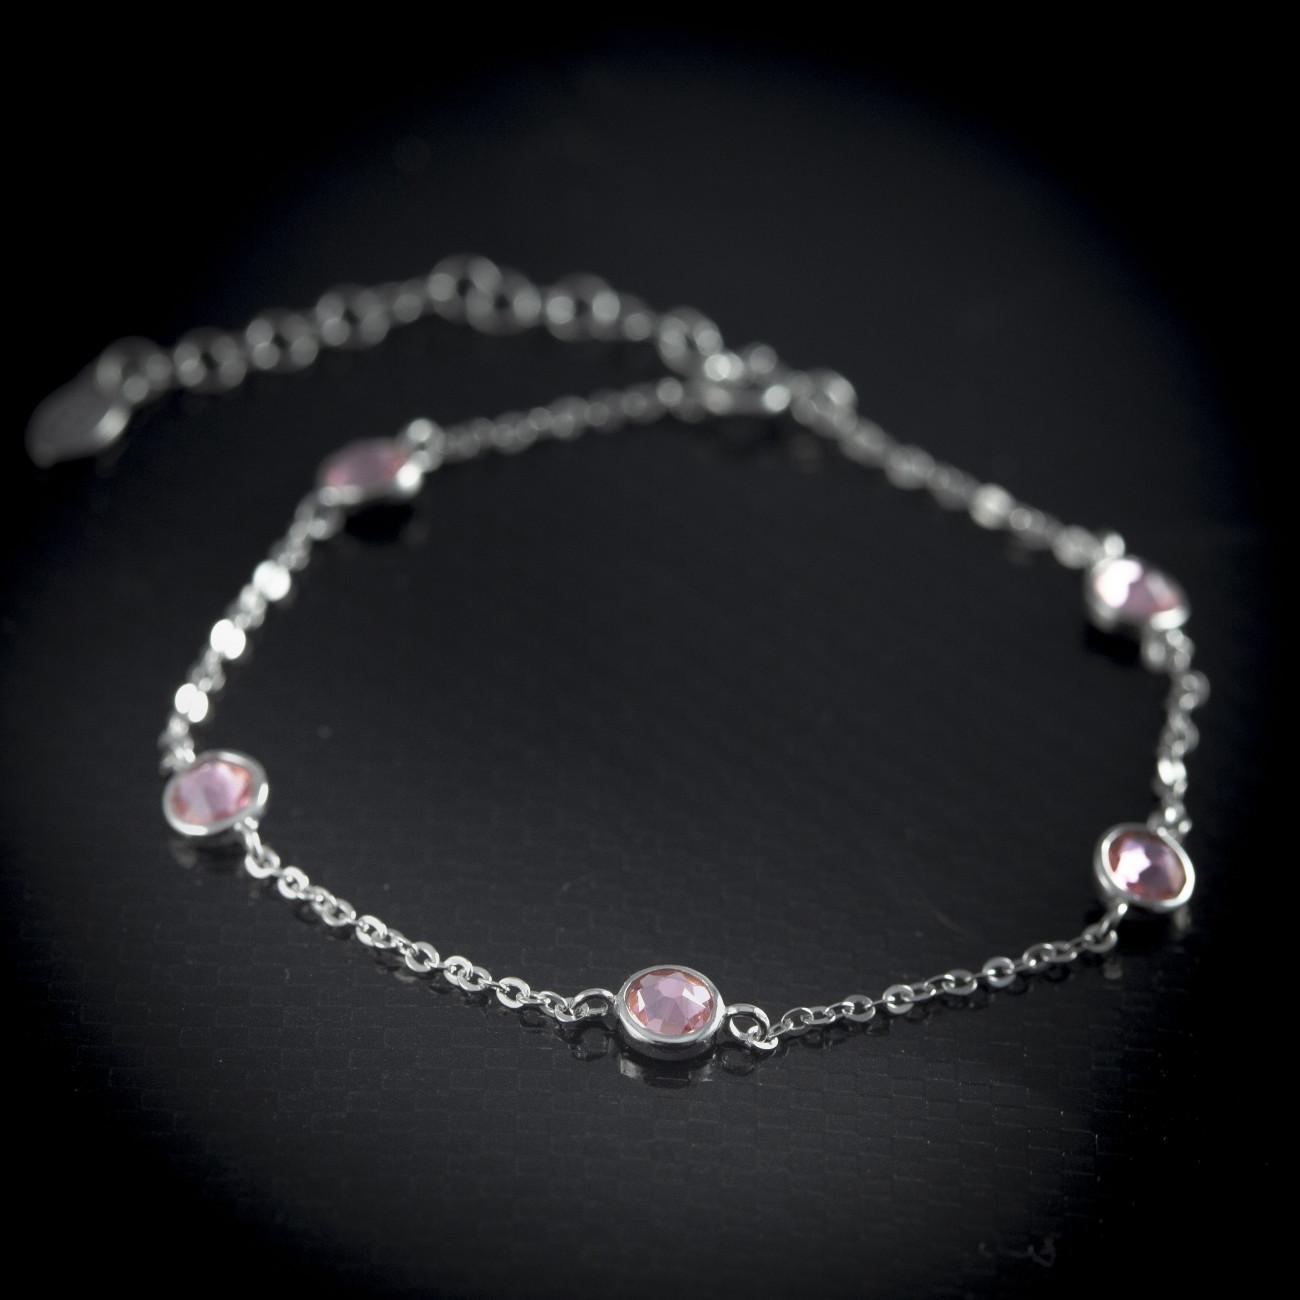 Stříbrný náramek Savour s light rose krystaly Swarovski